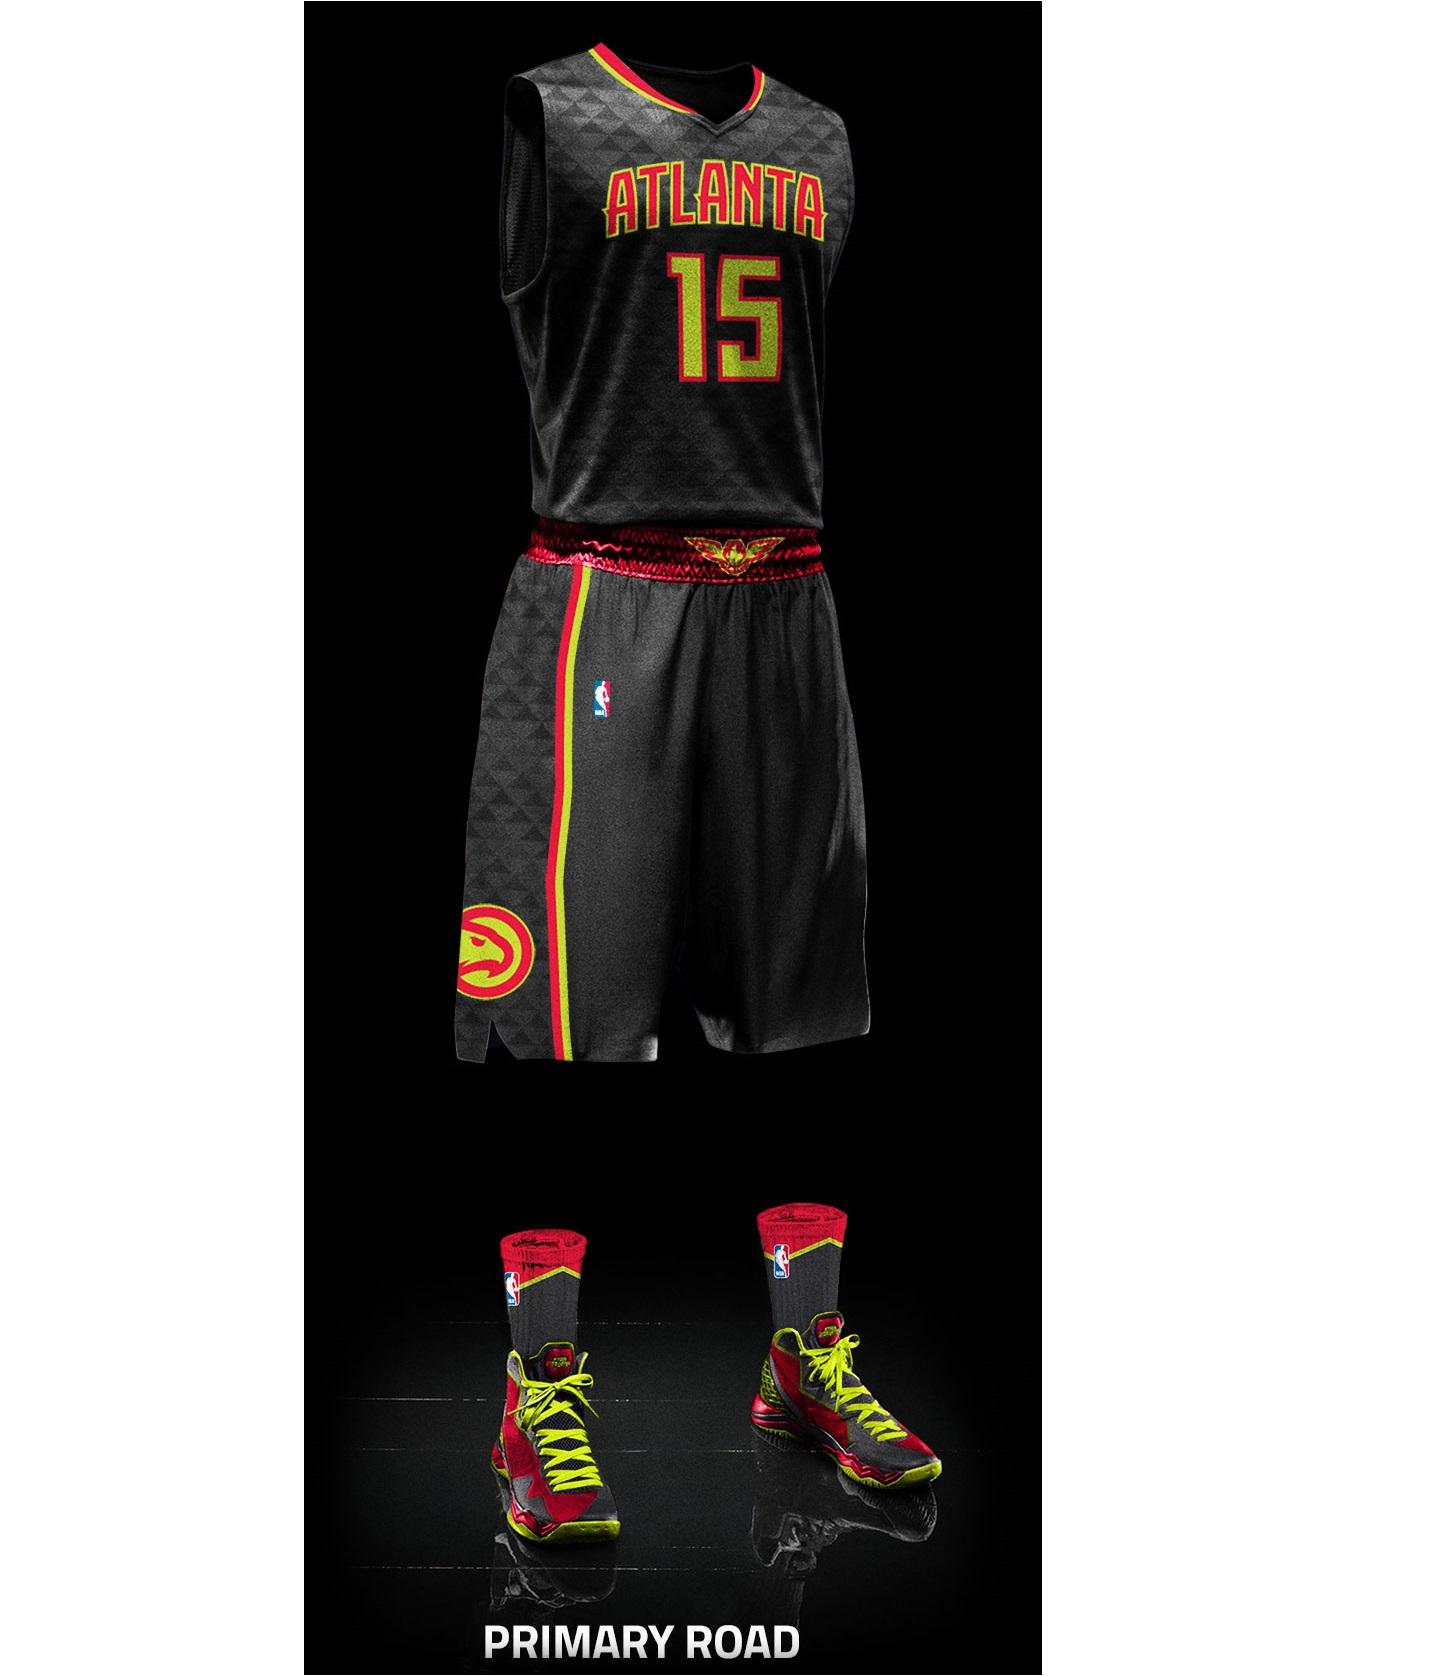 Atlanta Hawks - Away jersey